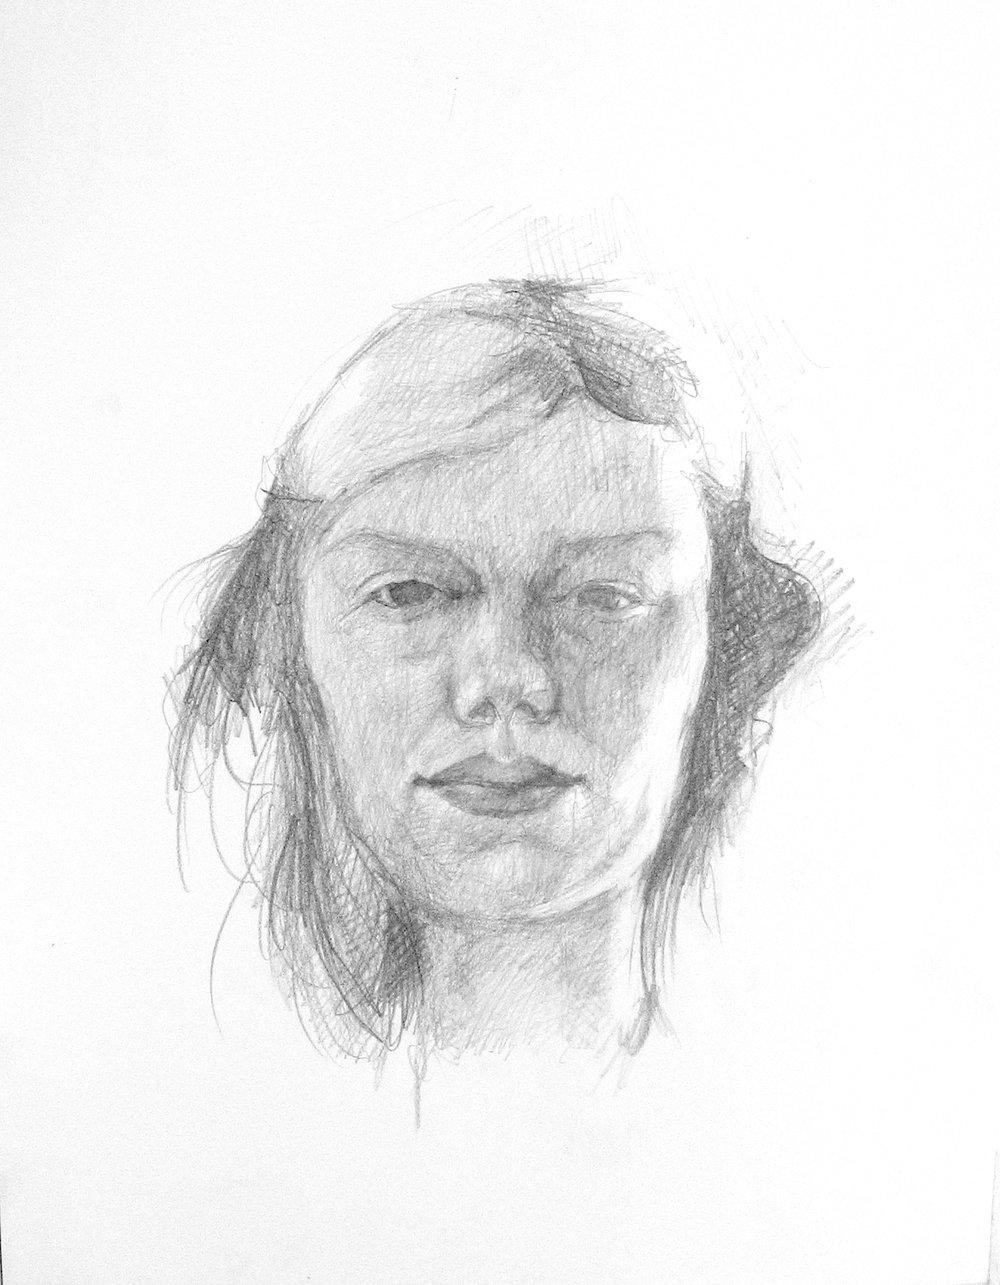 Self Portrait, 2004,pencil on paper,500x700 mm